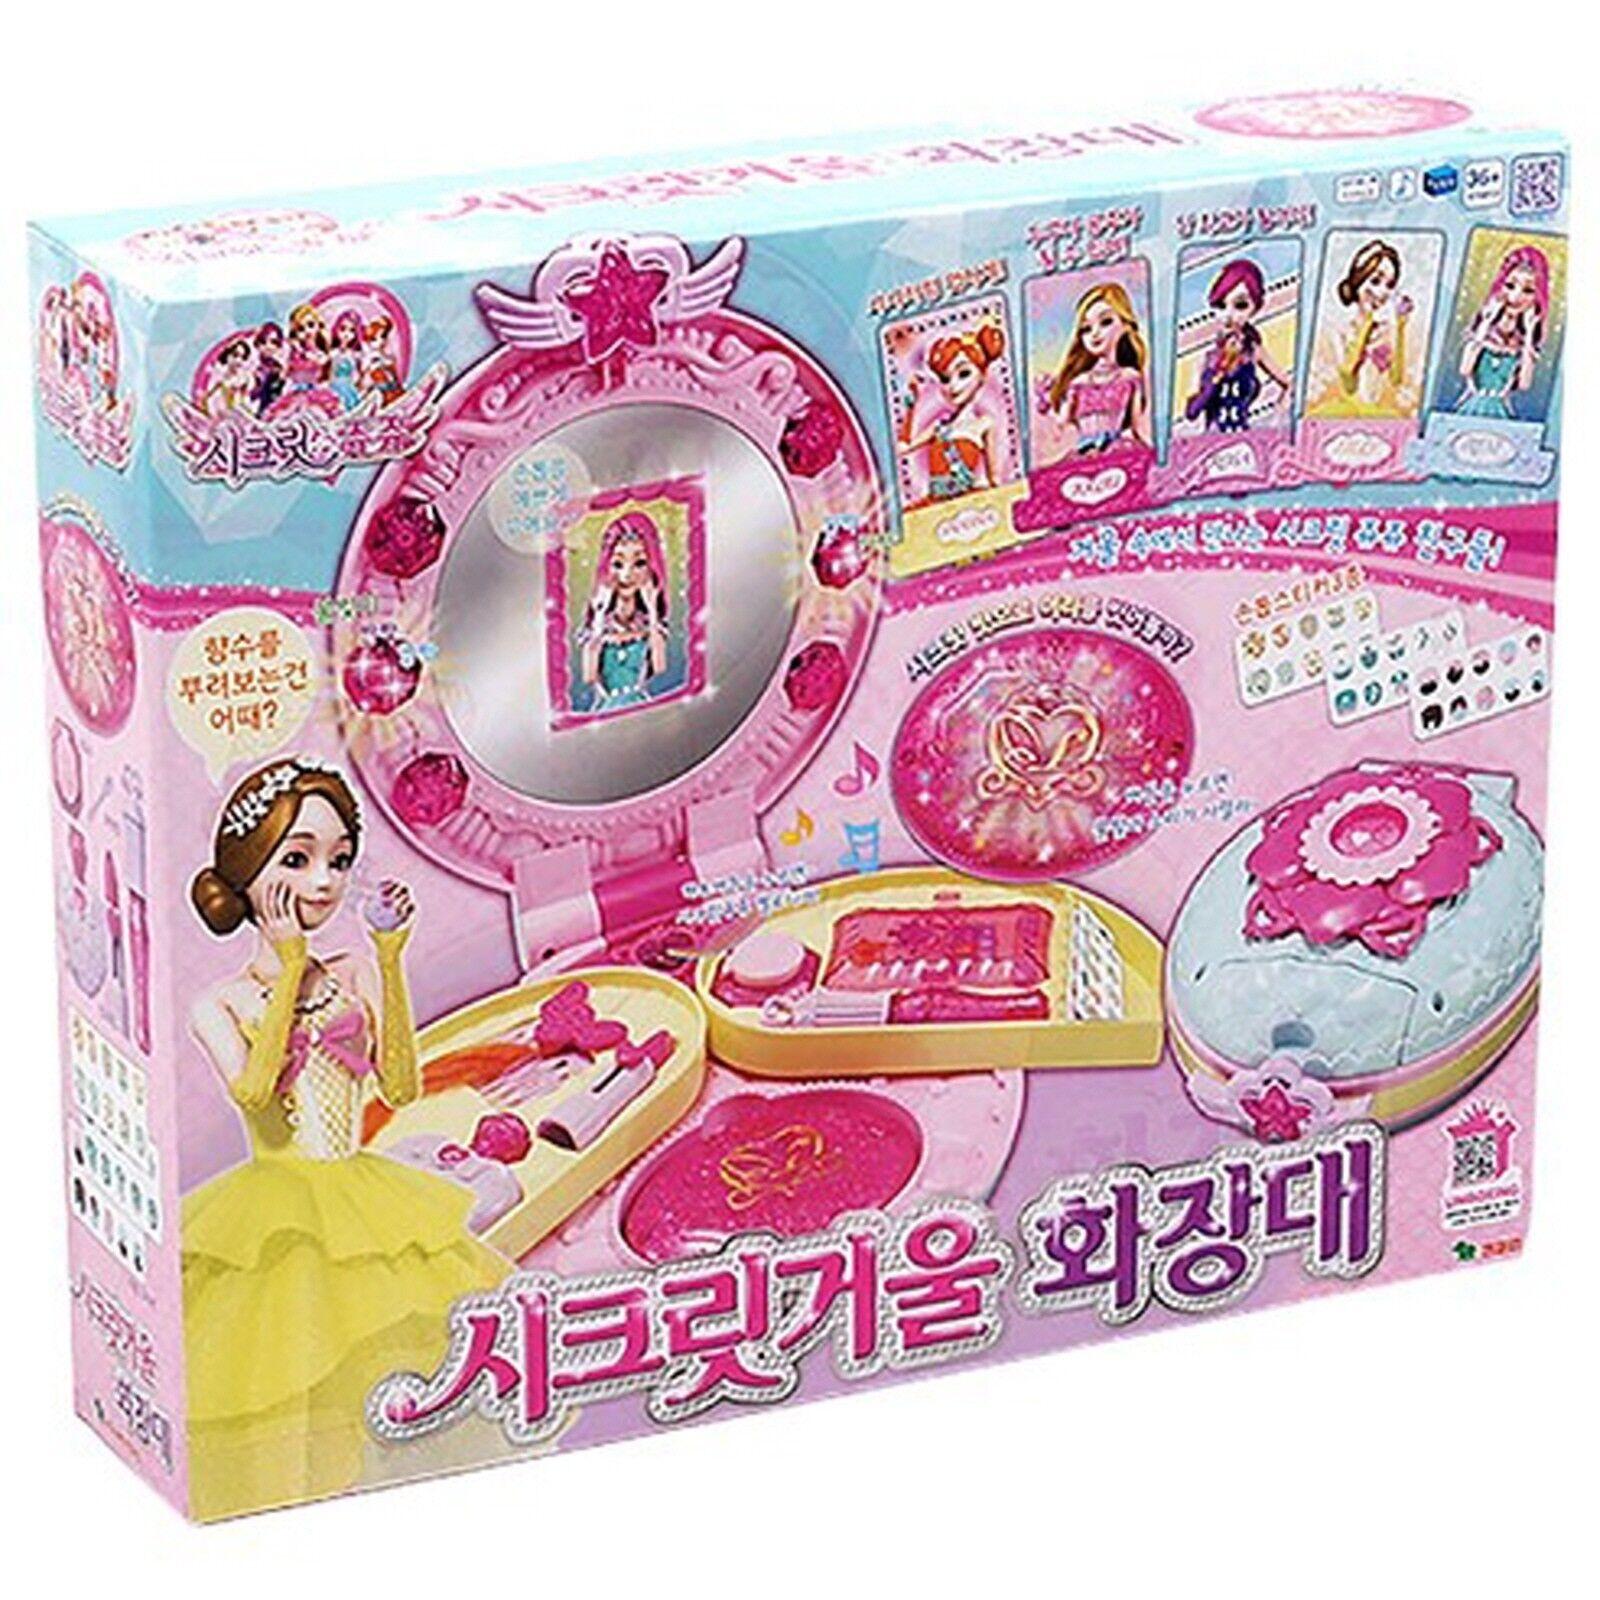 Secret JouJu Mirror Vanity juju dressing table /Korea Animation Girl's Toy gift